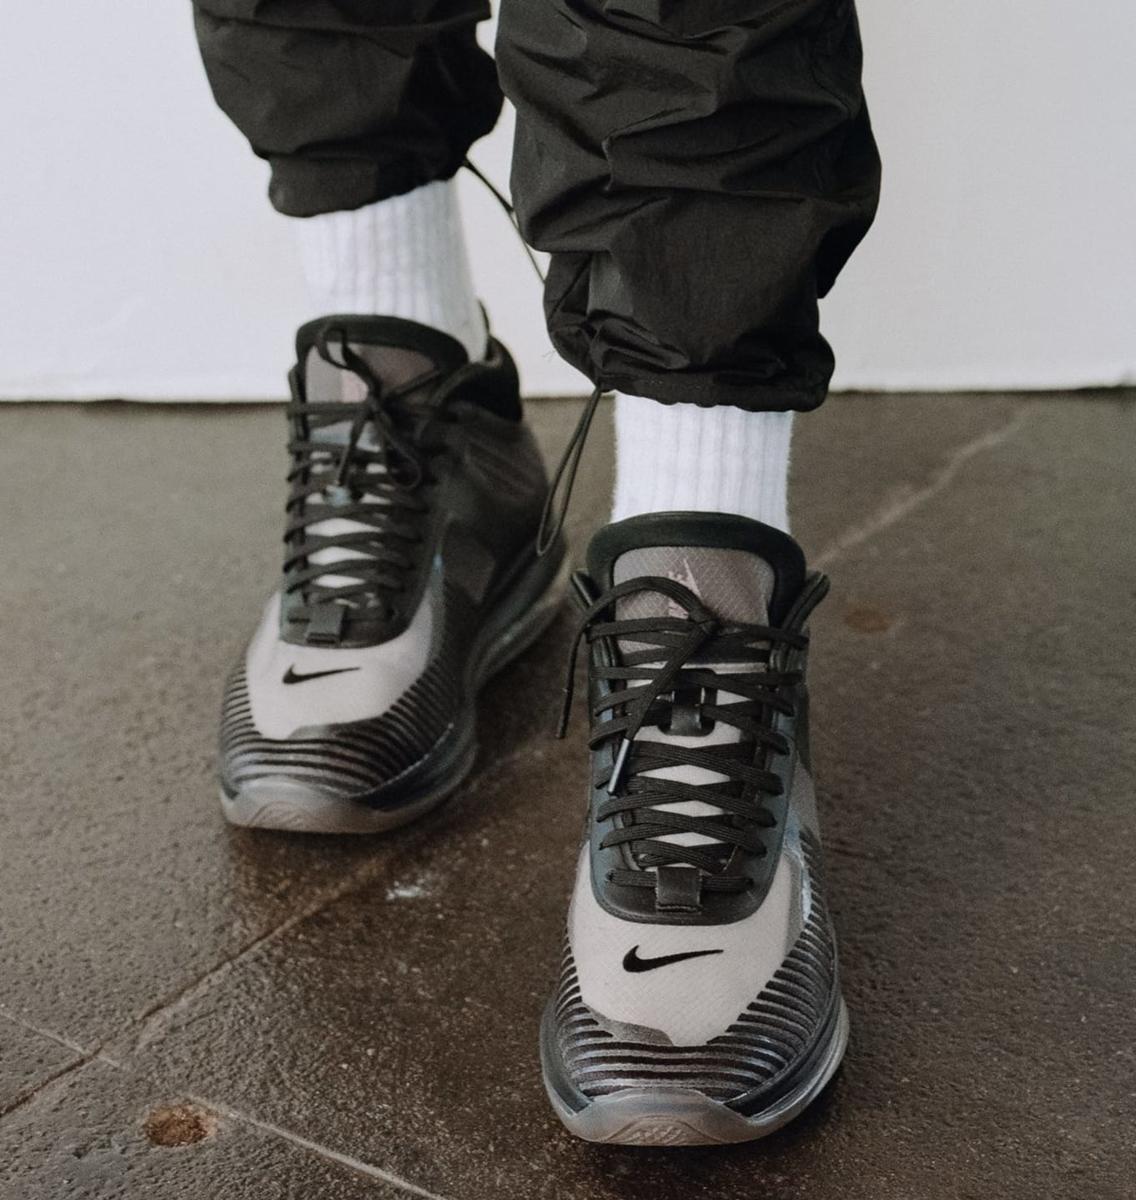 f:id:sneakerscaffetokyo:20190524142841j:plain